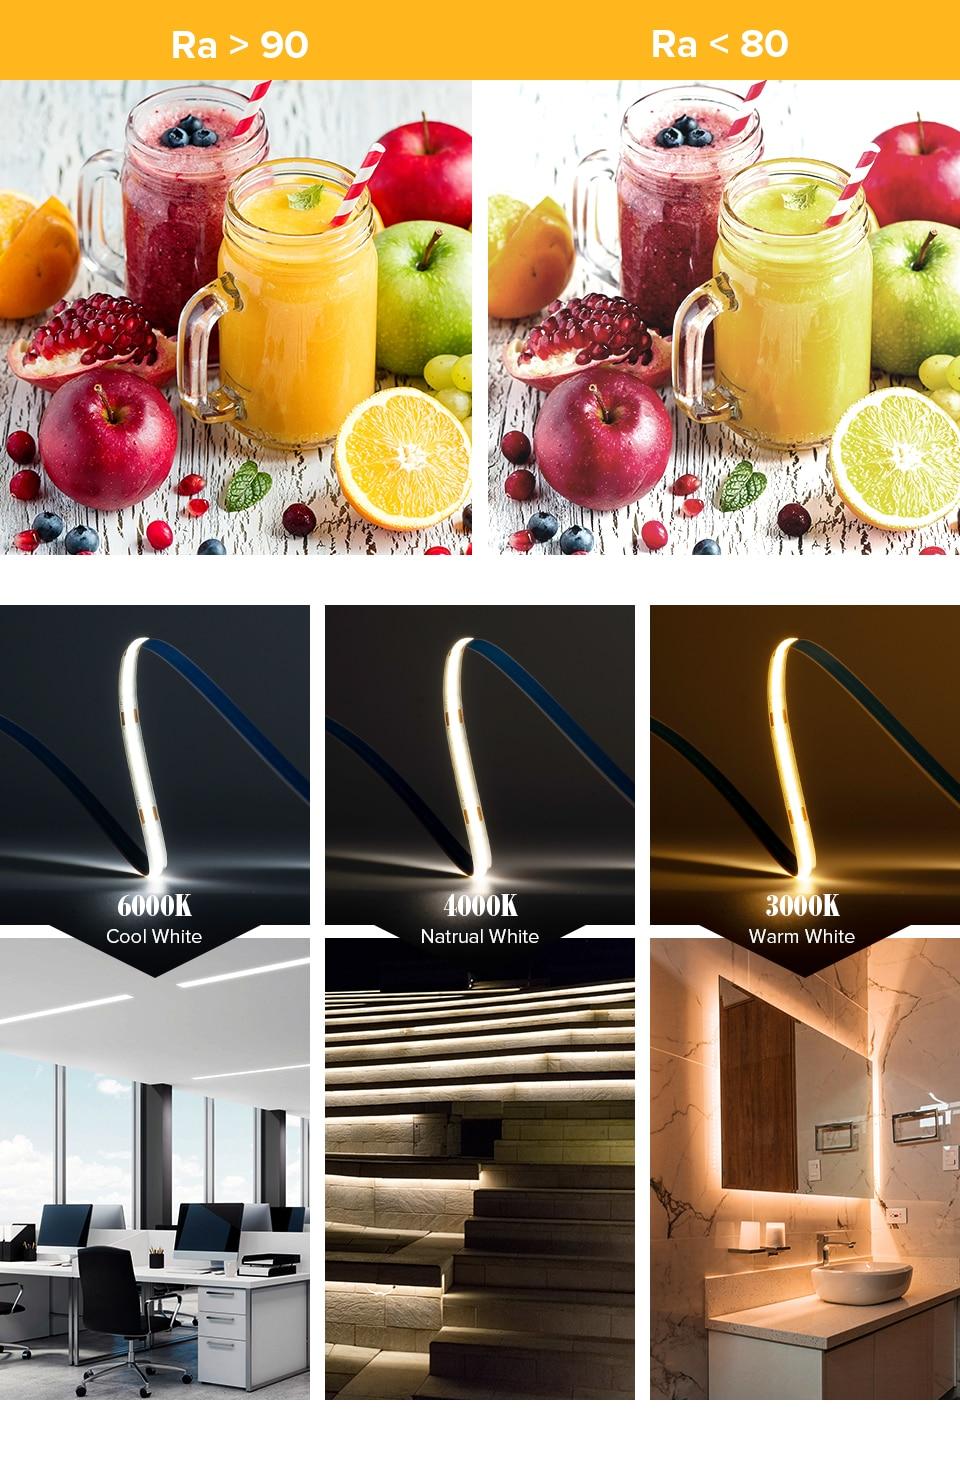 FCOB Led Lights 6mm PCB 512 LEDs RA90 High Density Flexible FOB COB LED Strip Light 3000K to 6000K Linear Dimmable DC12V 24V